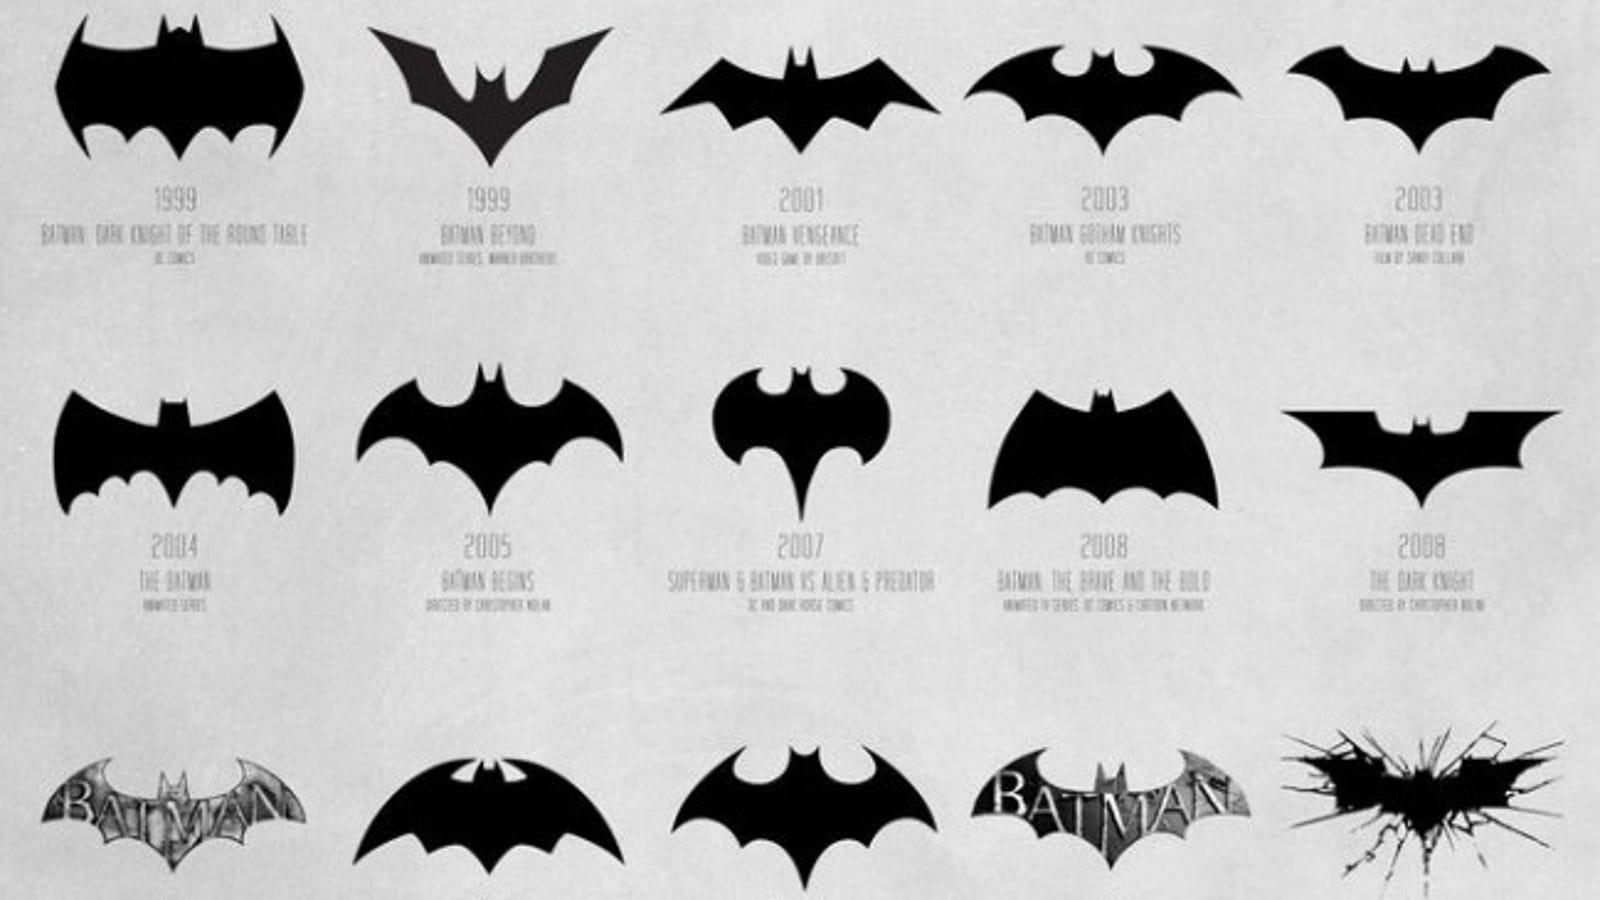 the evolution of the batman logo visualized